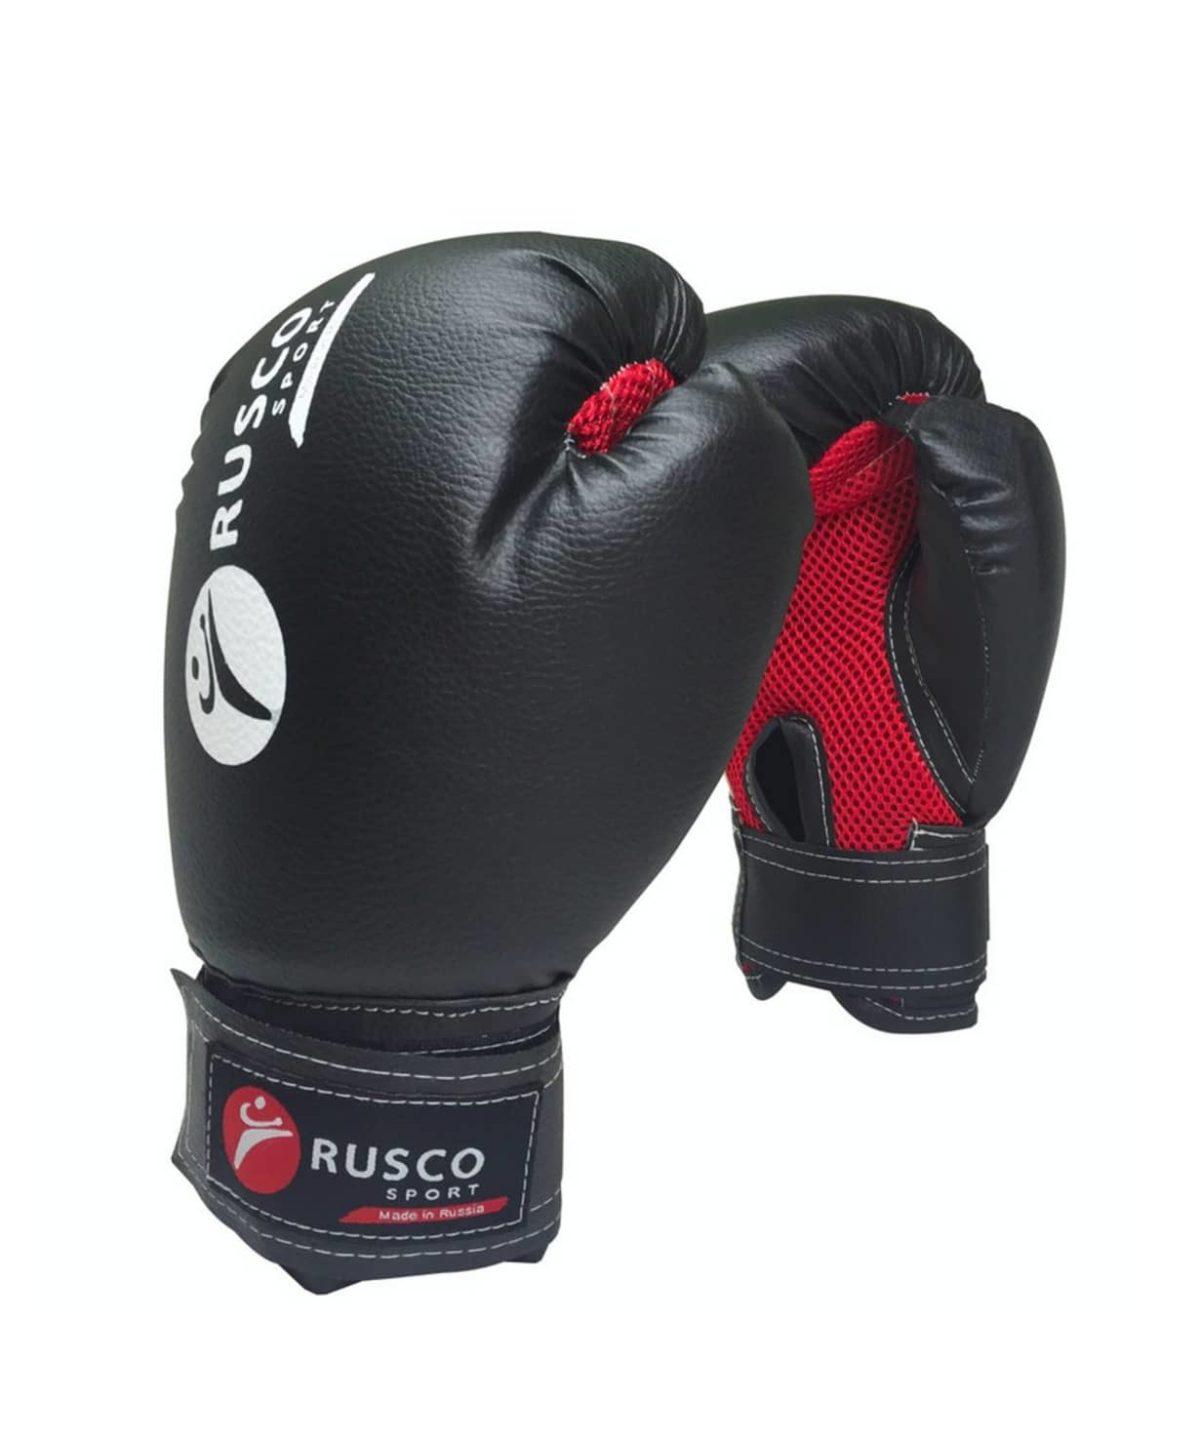 RUSCO Перчатки бокс. 8oz, к/з  18529 - 1